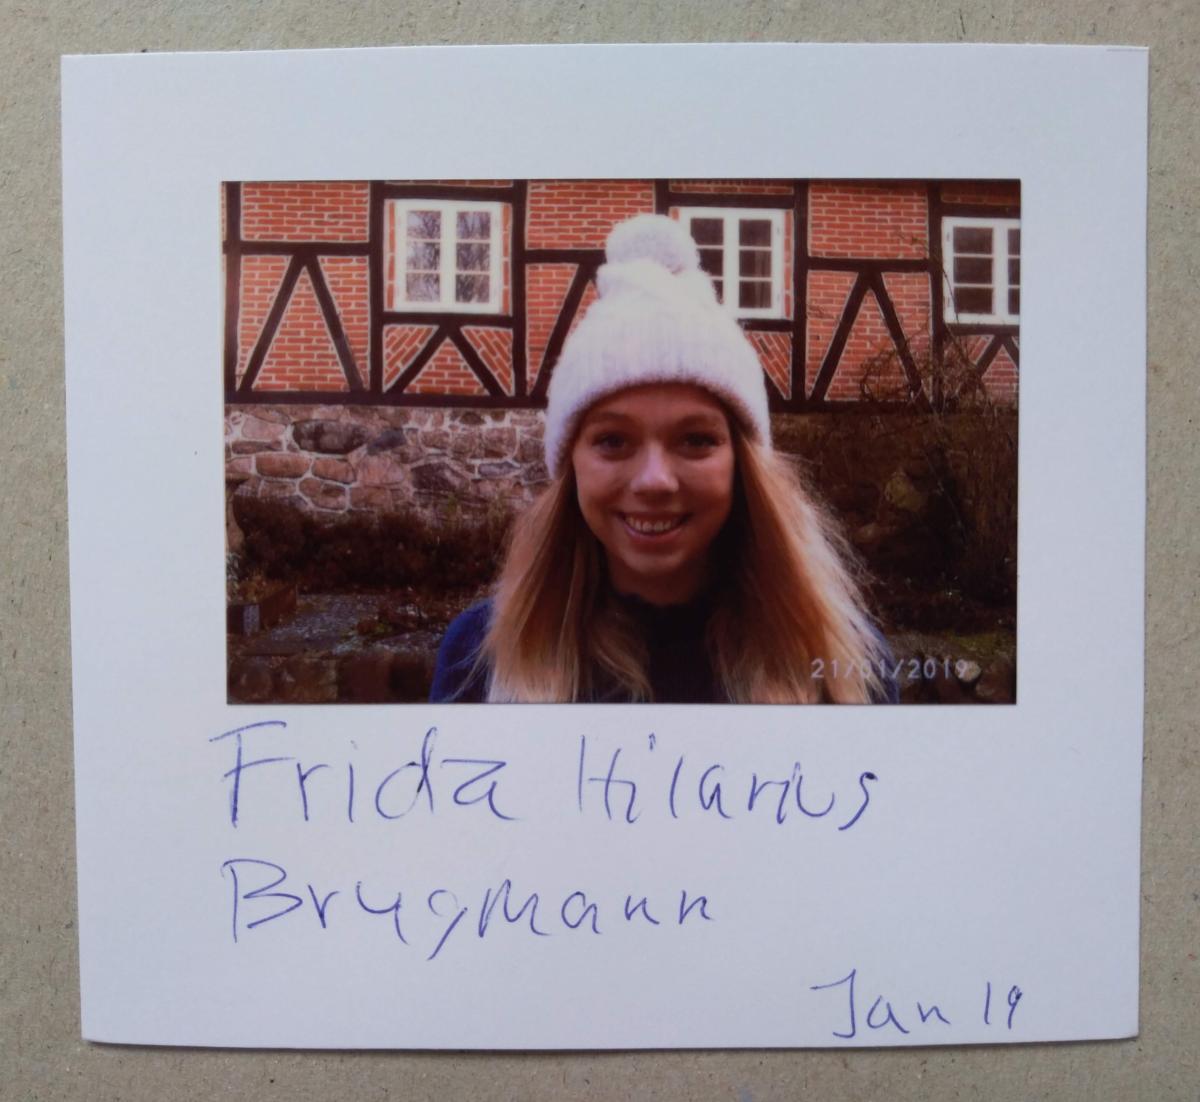 01-19 Frida Hilarius Brygmann